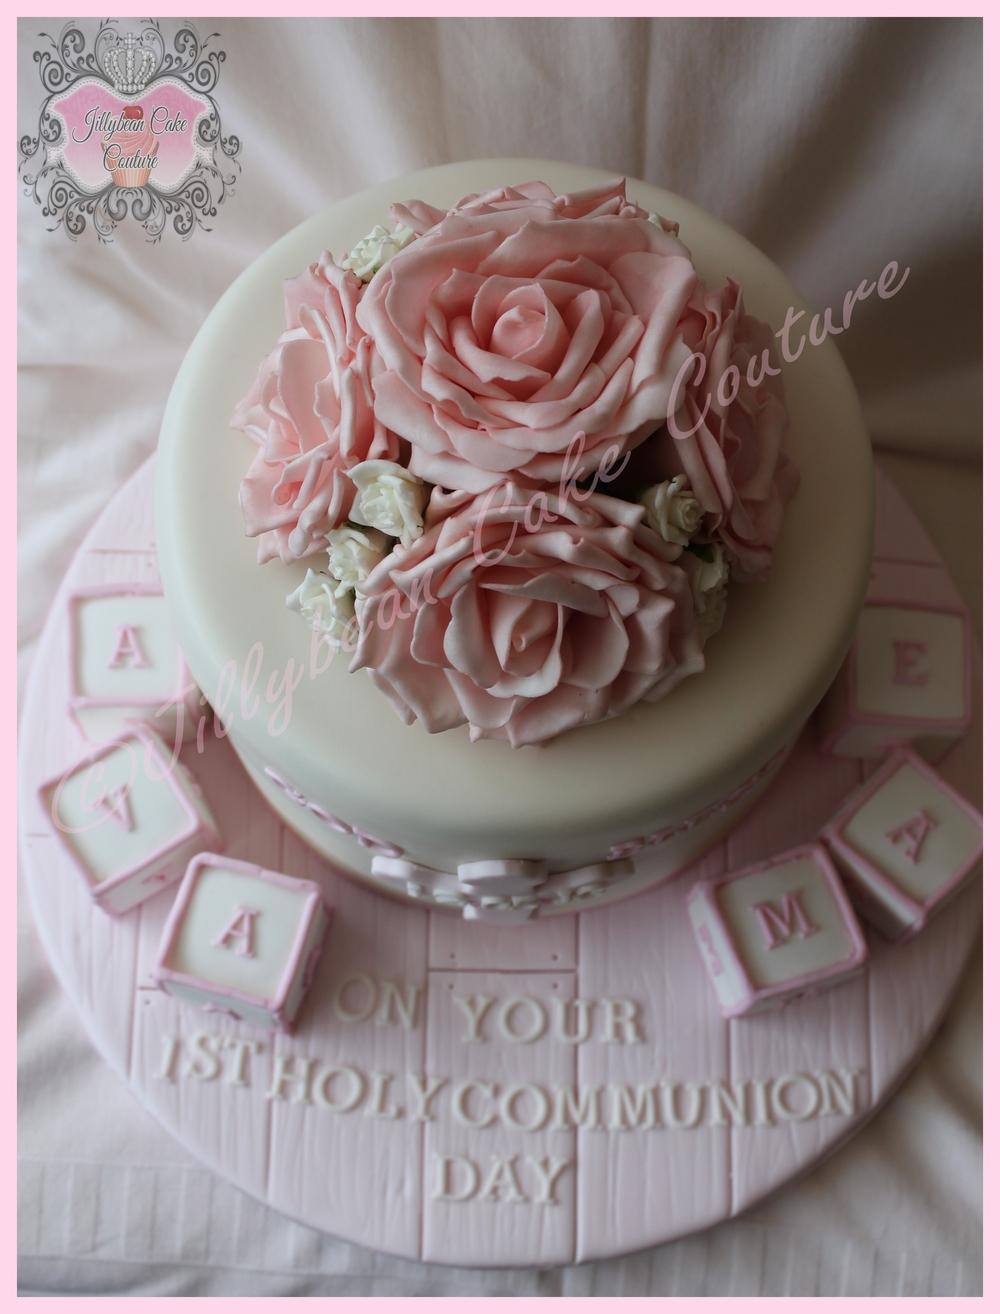 Jillybean Cakes